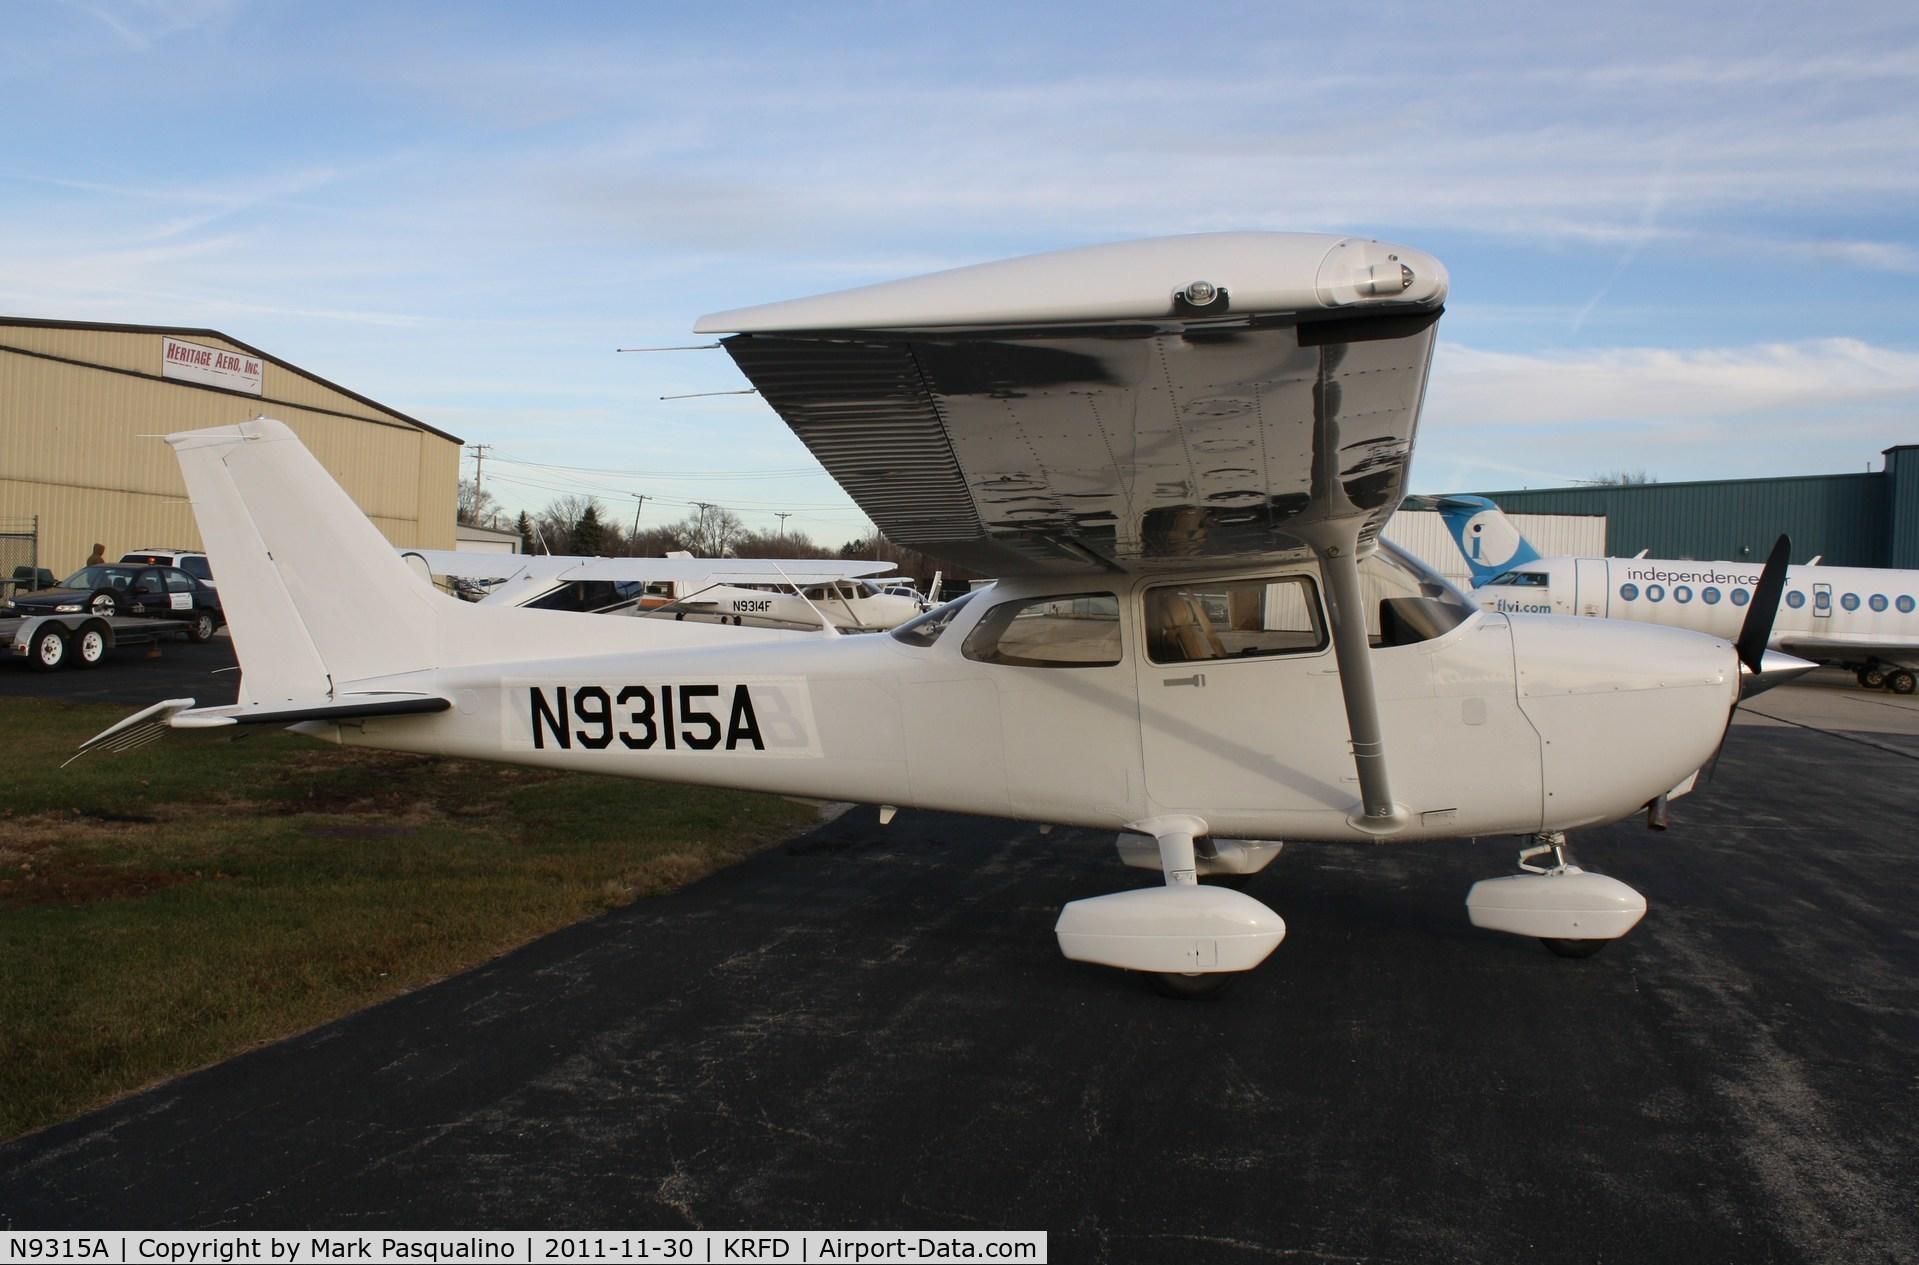 N9315A, 2011 Cessna 172S Skyhawk C/N 172S11145, Cessna 172S